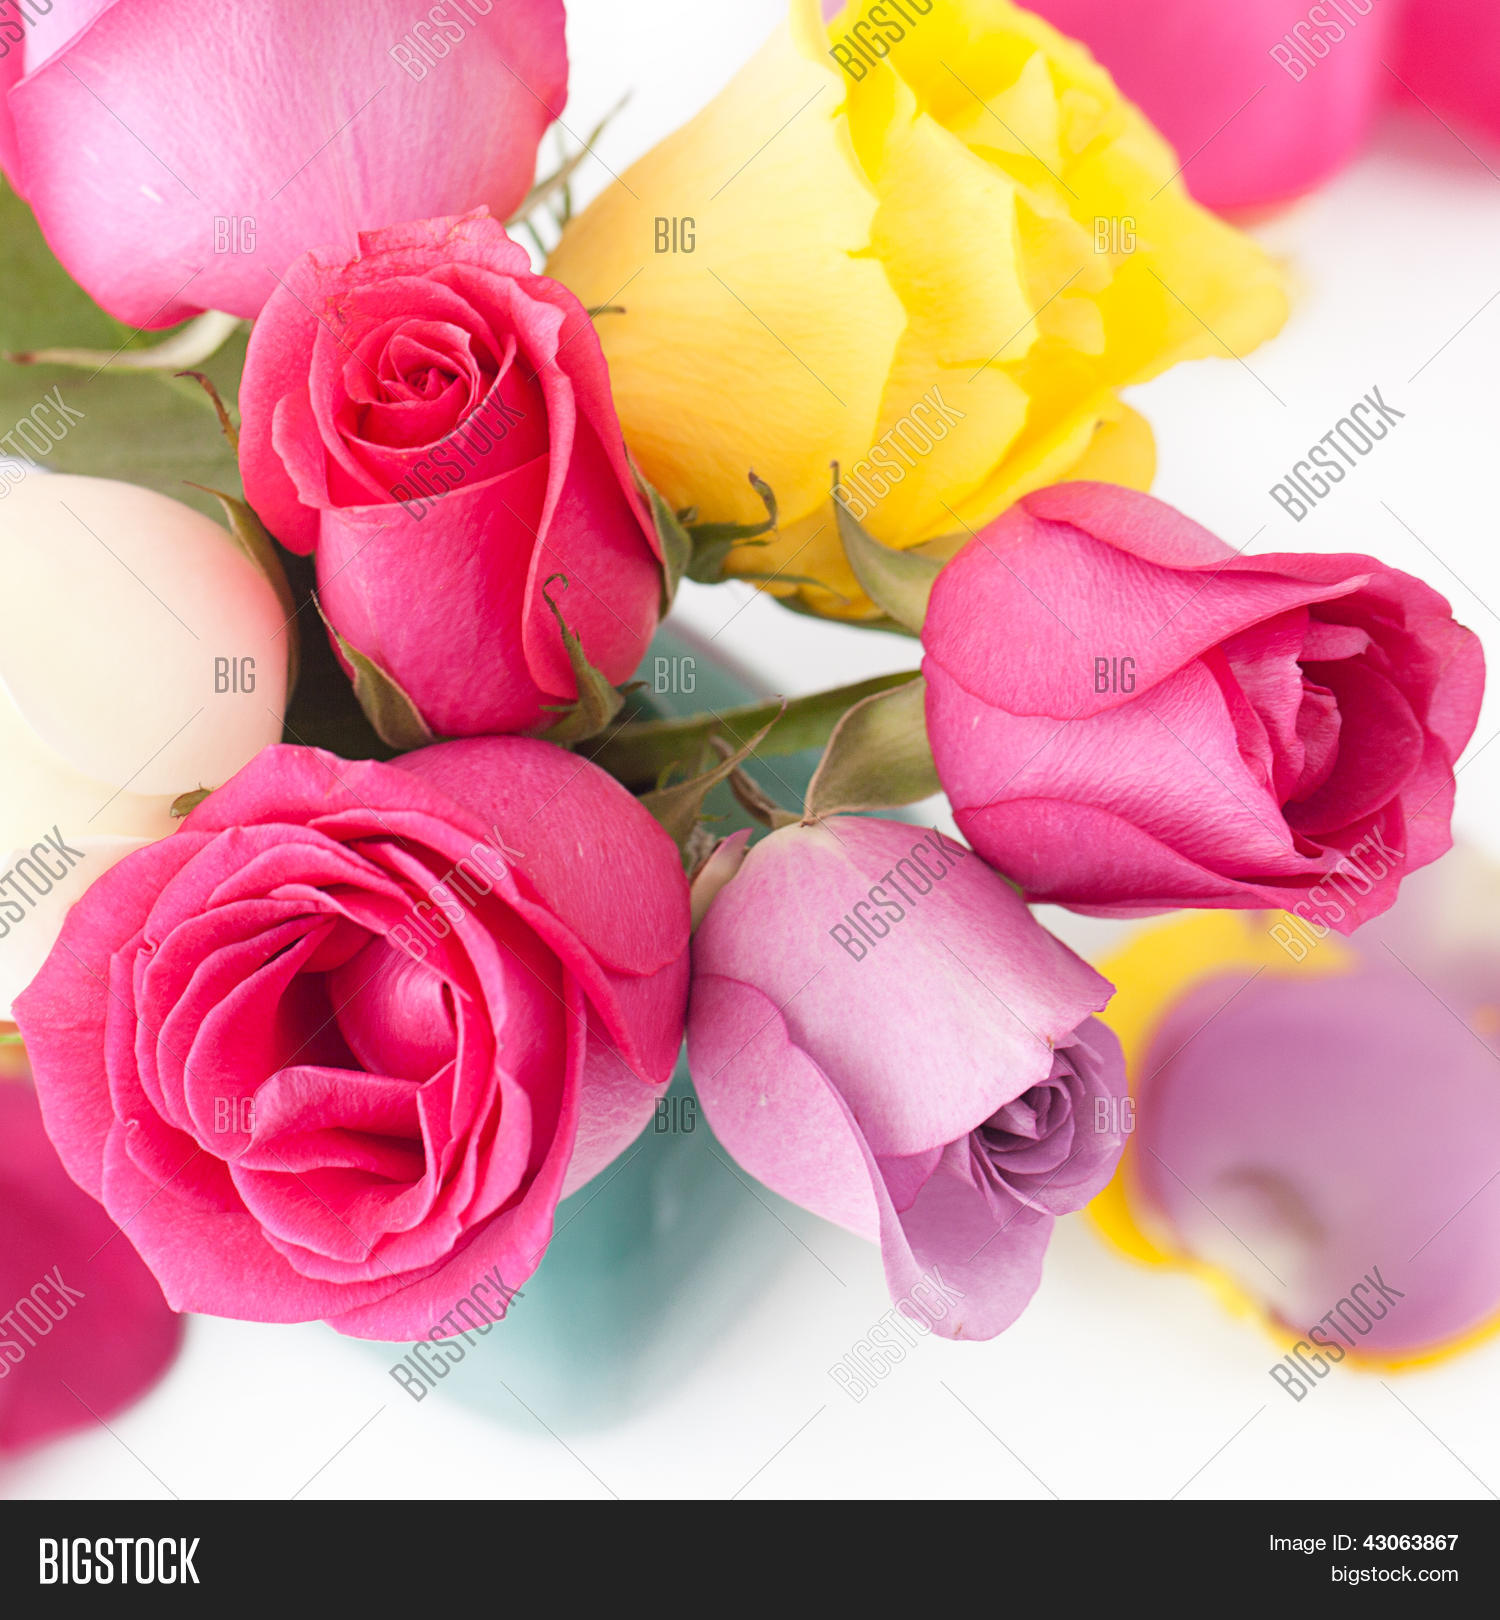 Ass Maduras http://www.bigstock.br/image-43063552/stock-photo